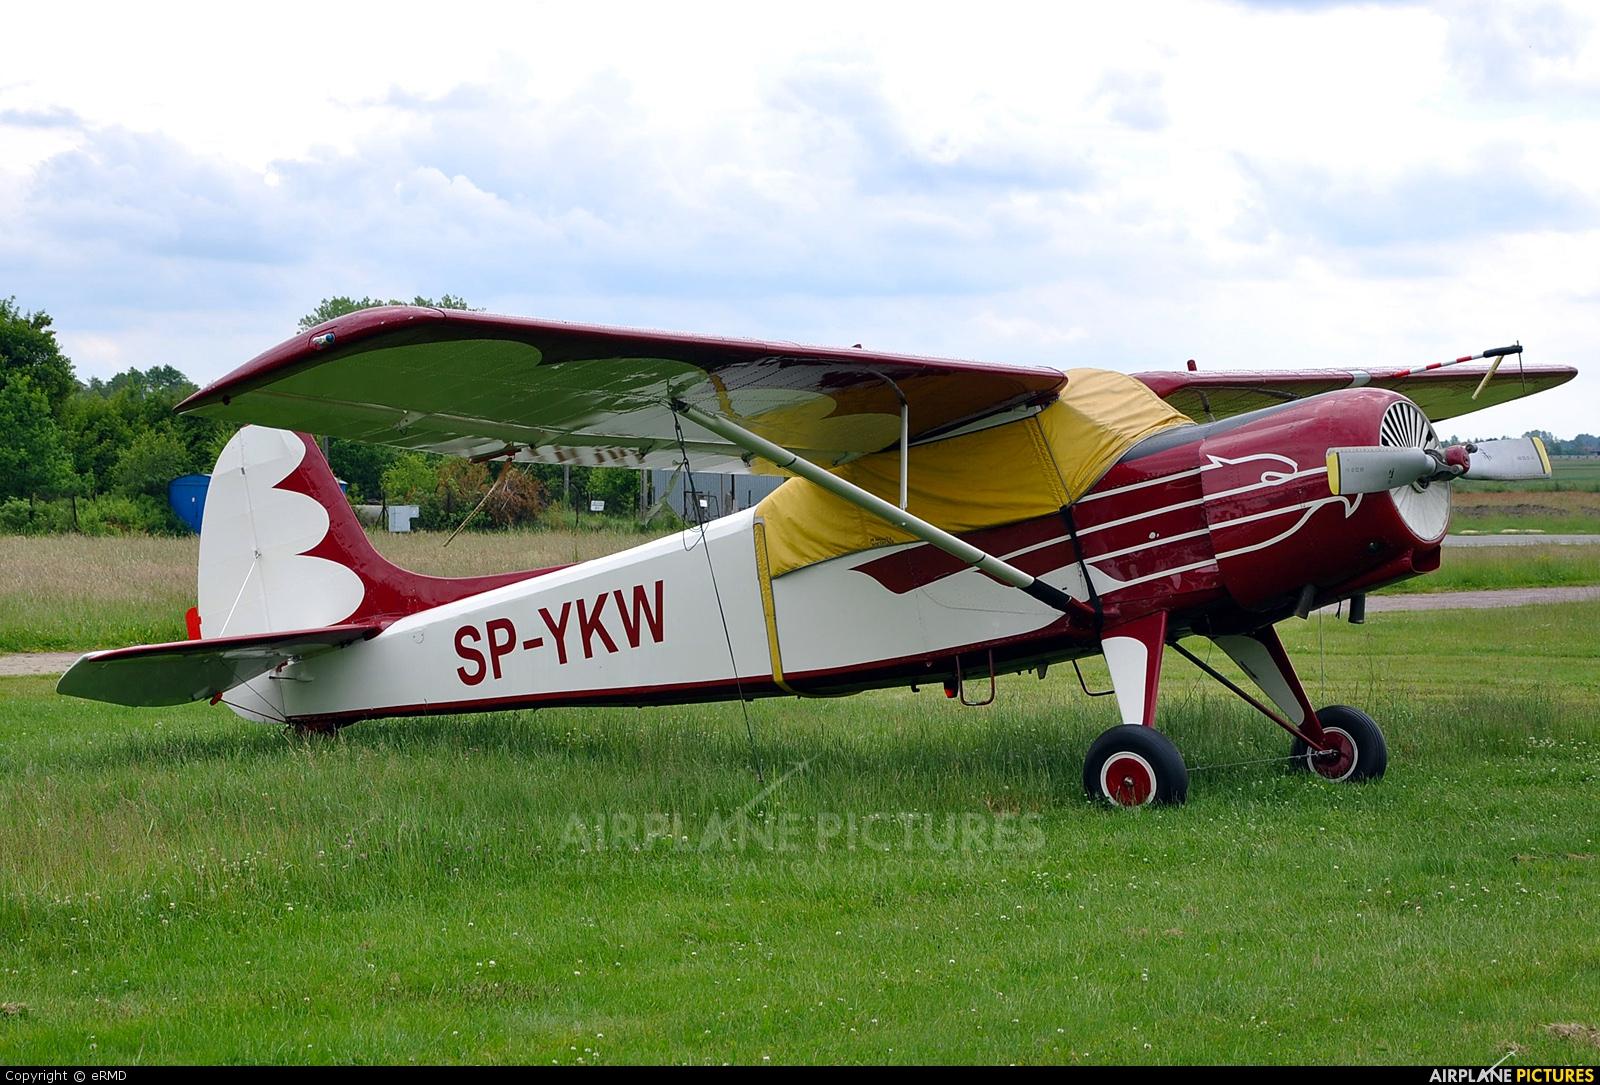 Aeroklub Orląt SP-YKW aircraft at Radom - Piastów